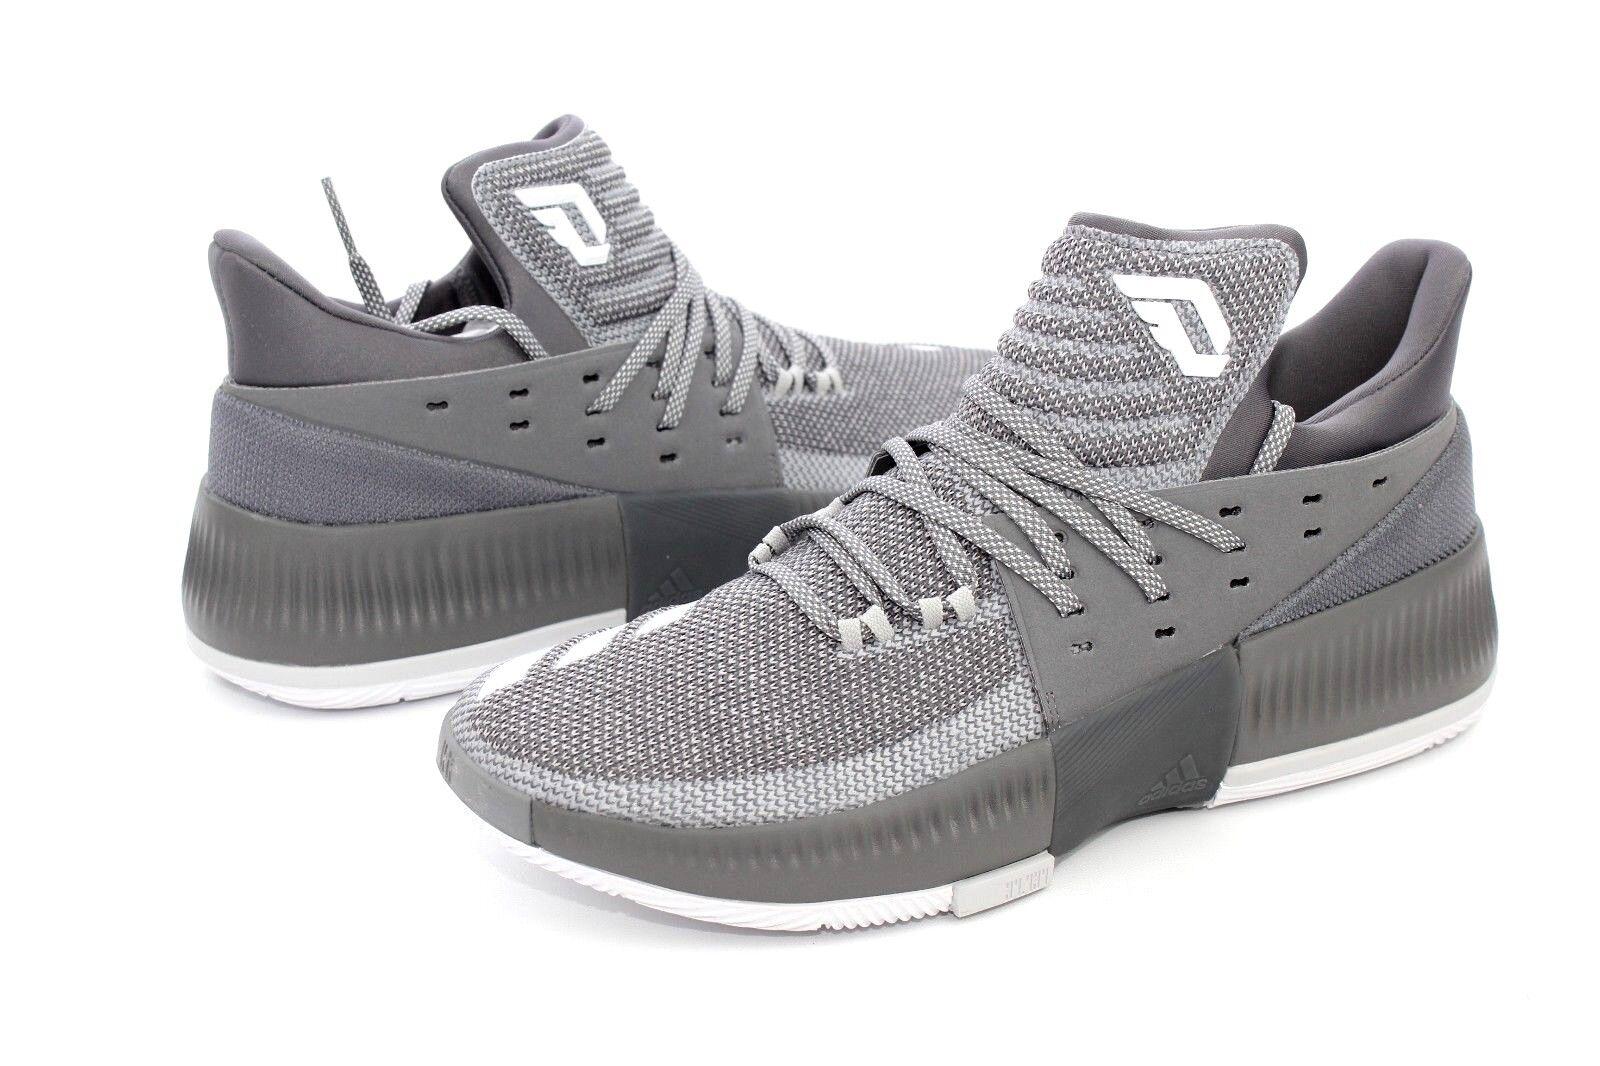 Adidas Damian Lillard Dame 3 Grey White BY3193 Basketball Shoes Size 11.5 US NIB